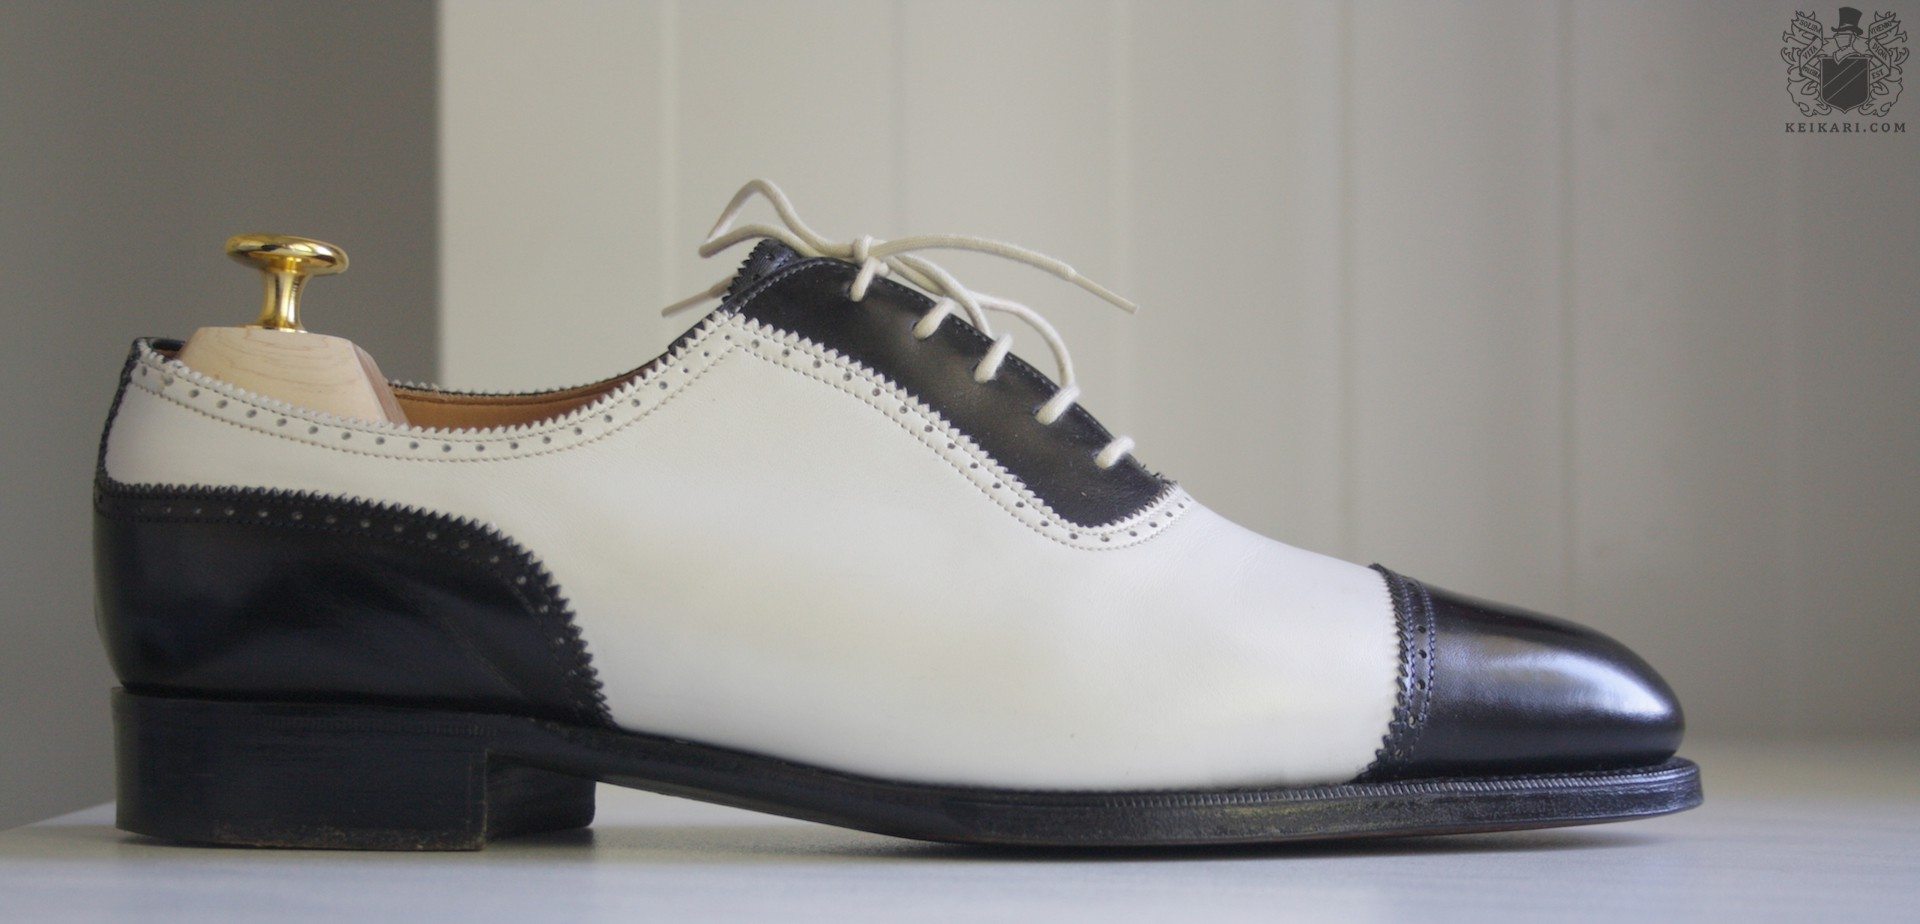 Edward_Green_blackwhite_prototype_spectator_shoes_from_Keikari_dot_com06.jpg